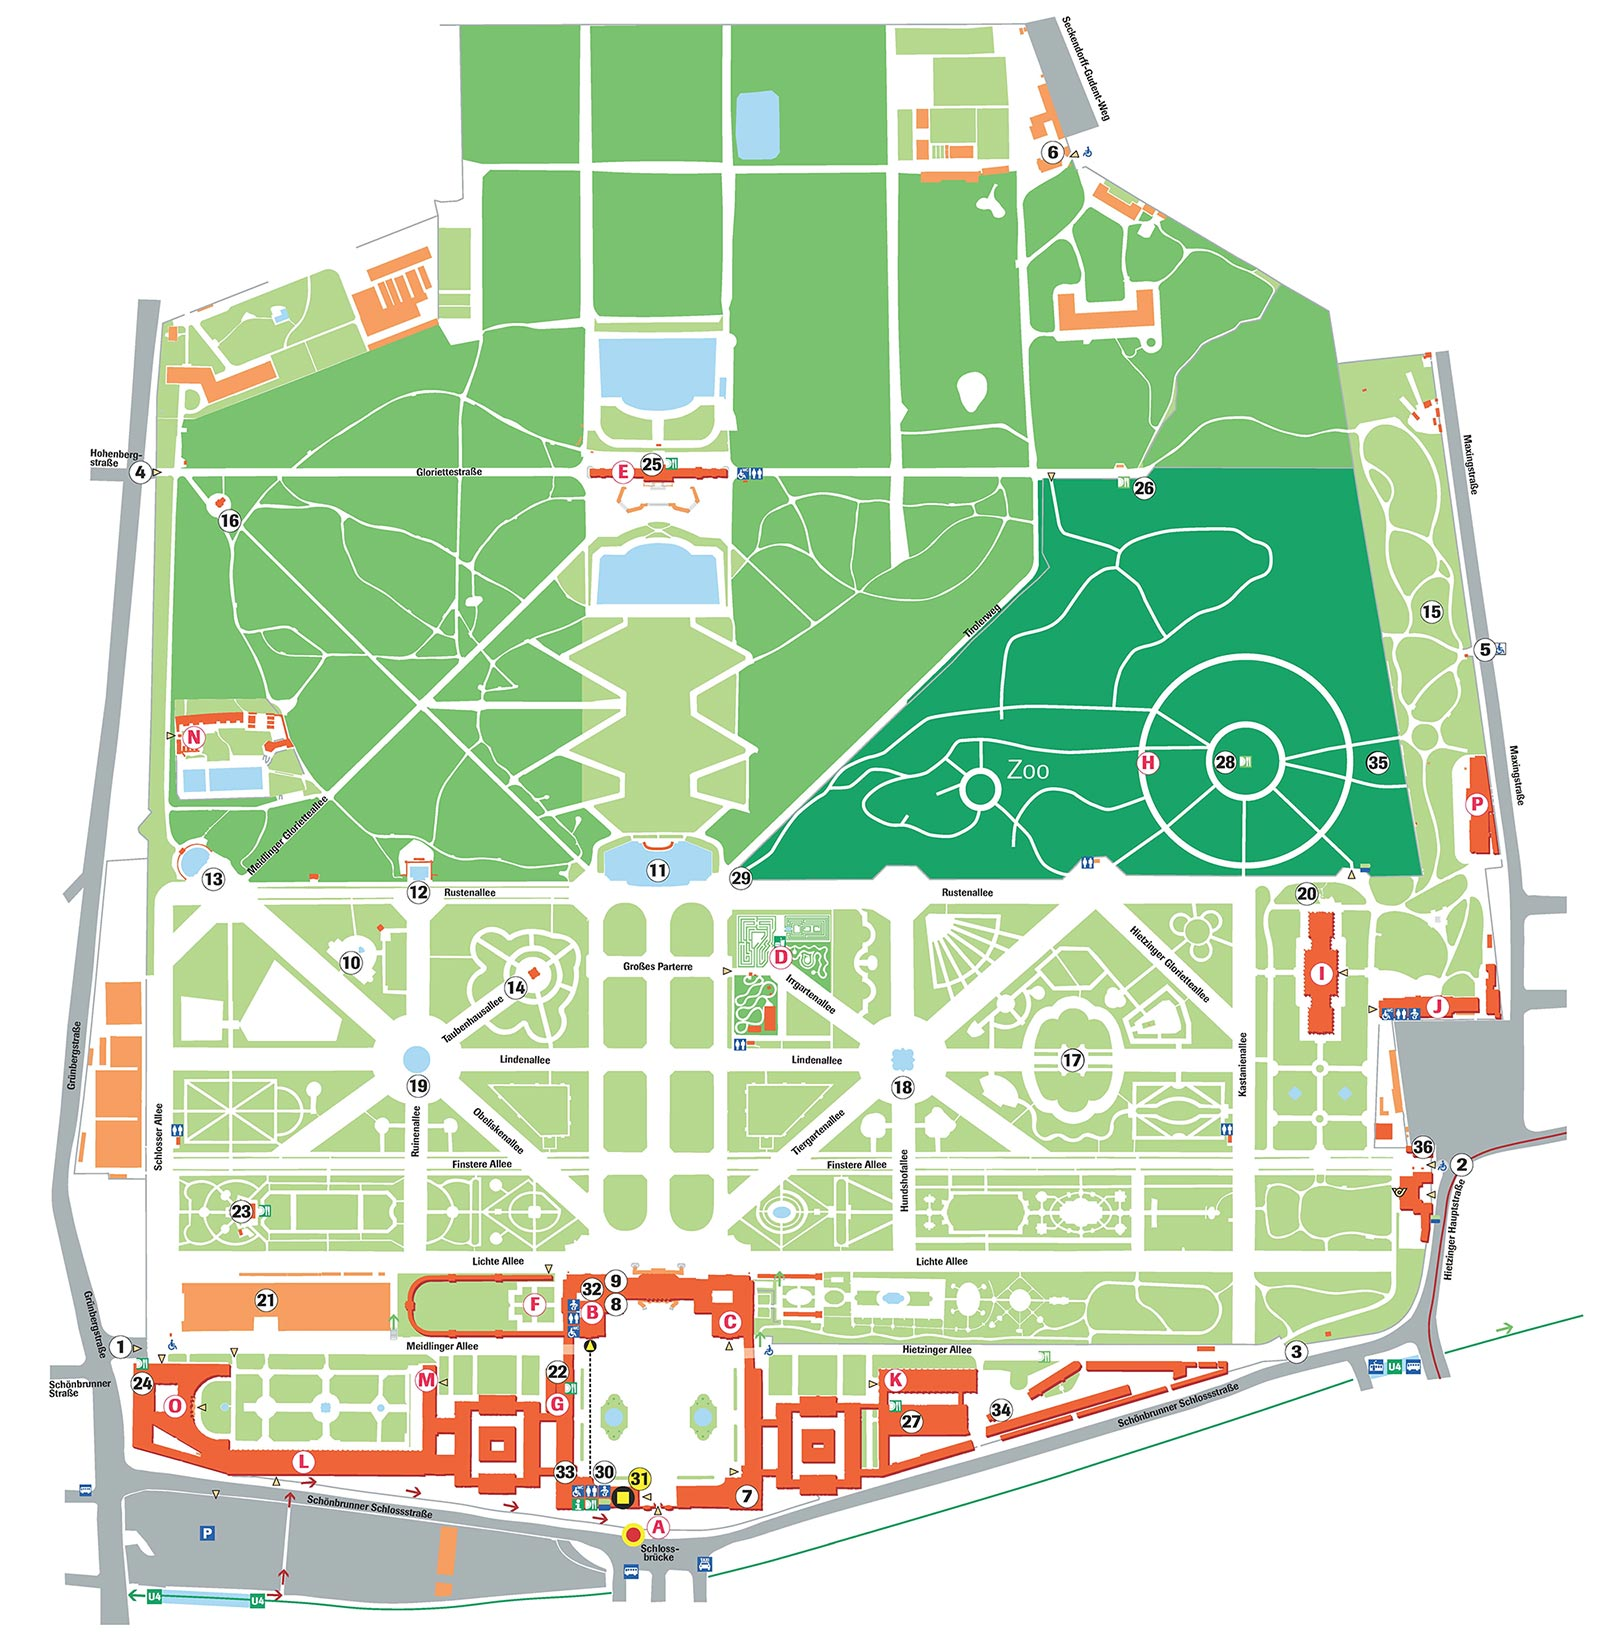 avusturya schonbrunn sarayi haritasi